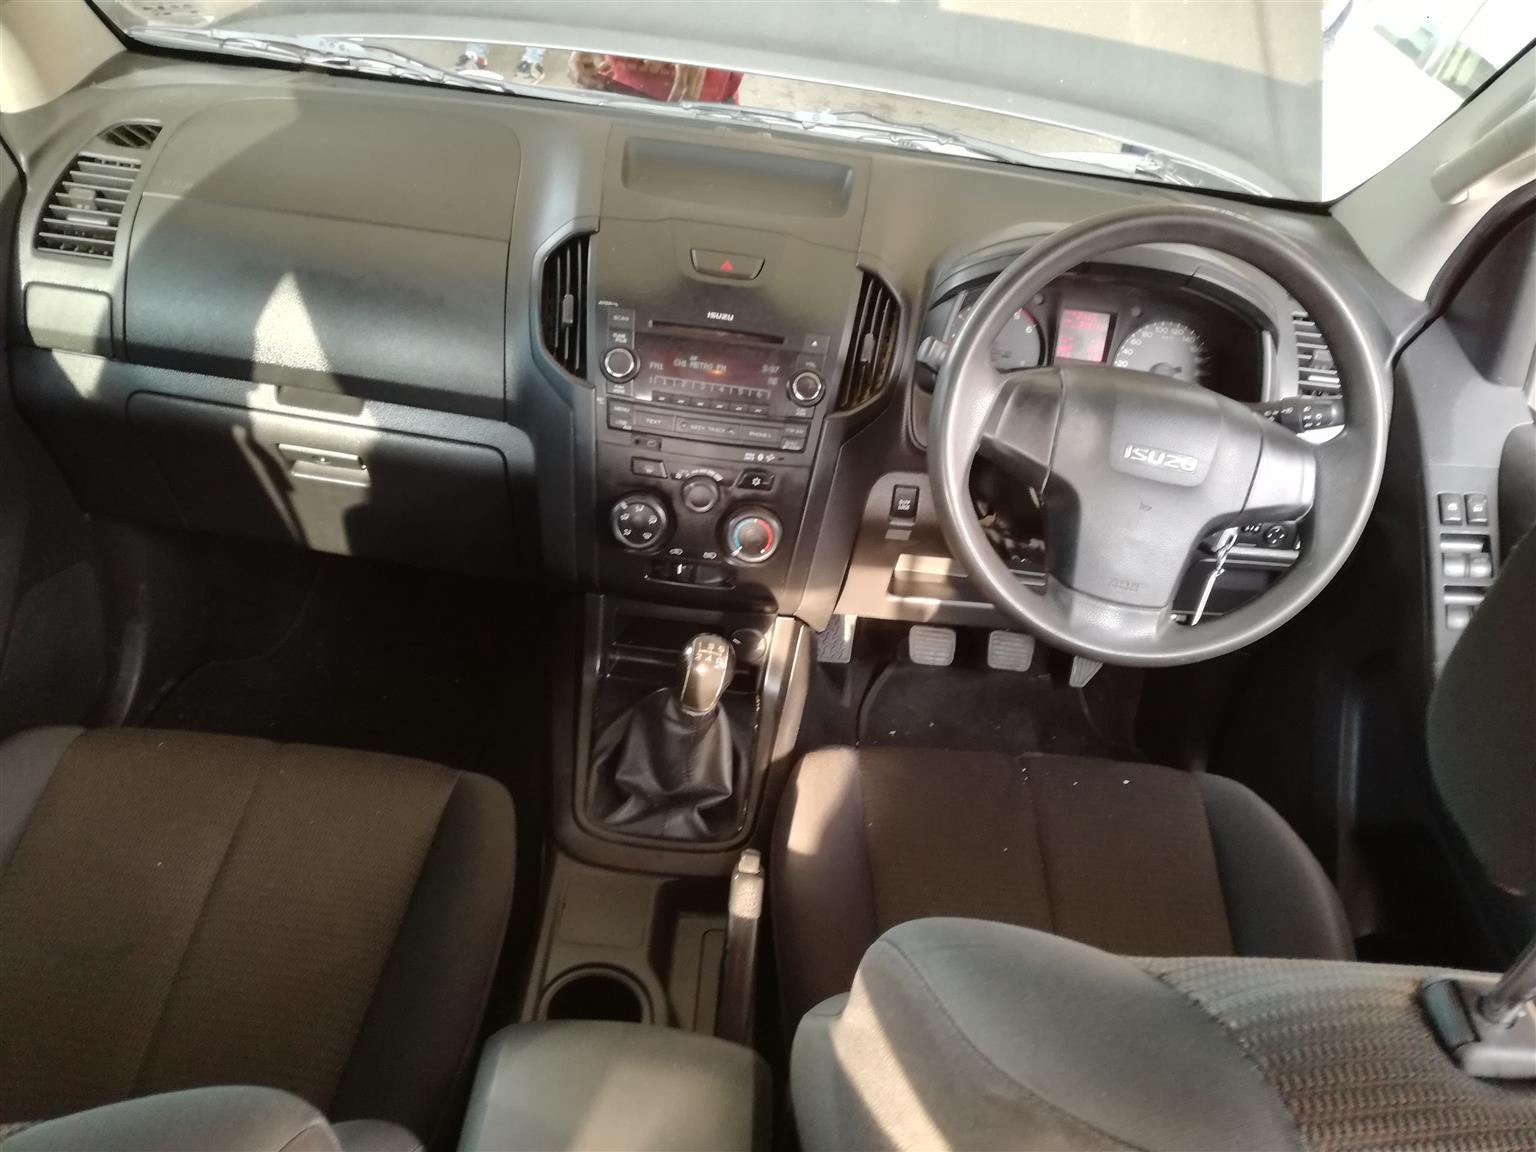 2015 Isuzu KB 250D Teq double cab Hi Rider